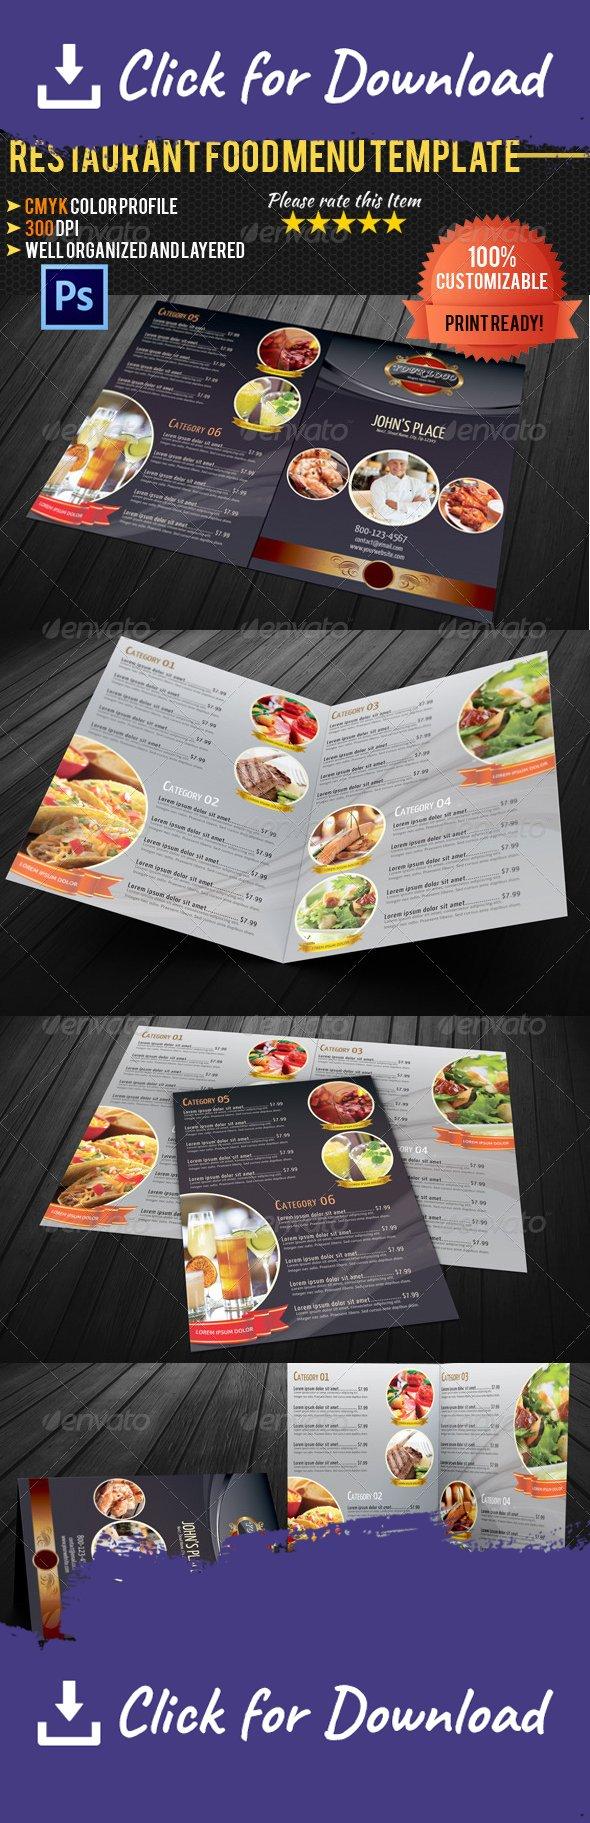 Bi-fold Restaurant Food Menu Template